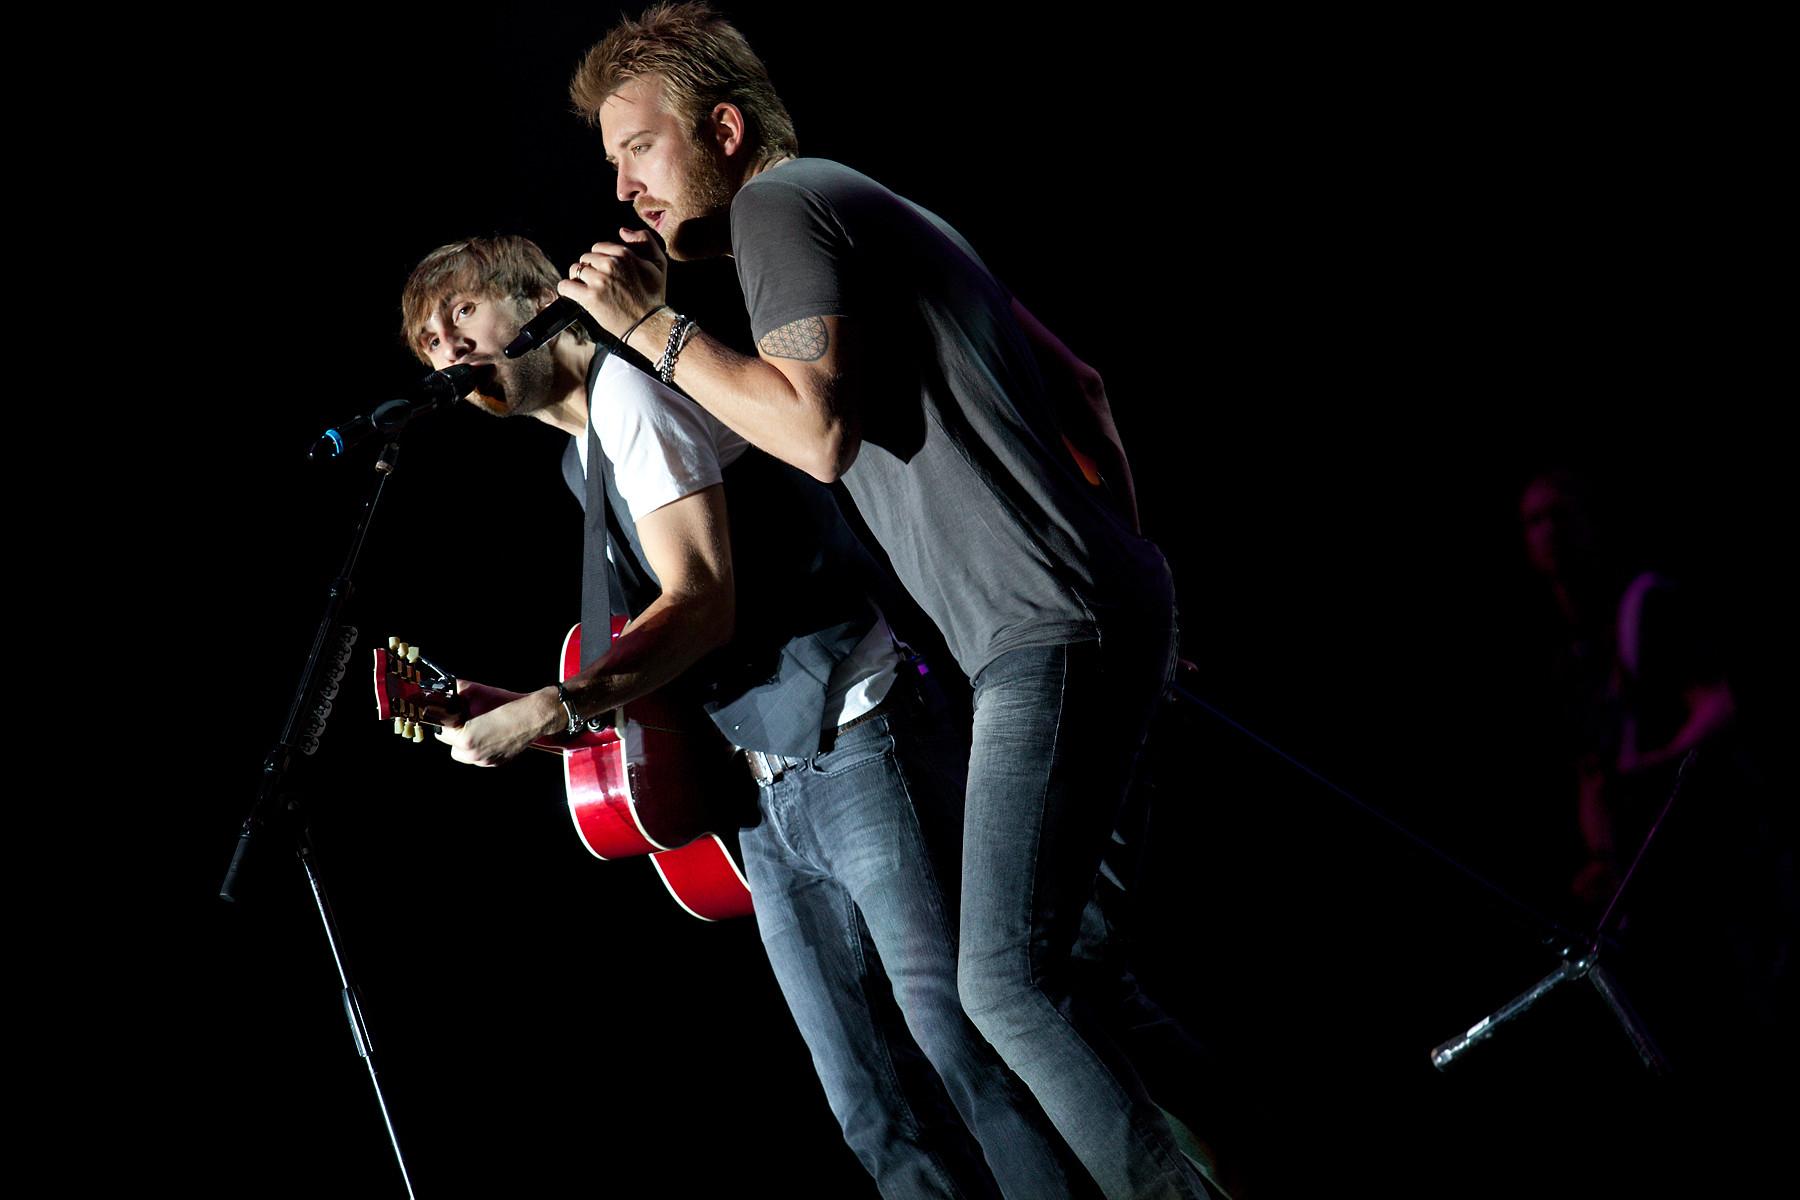 Lady Antebellum @ CMT Music Festival 2011